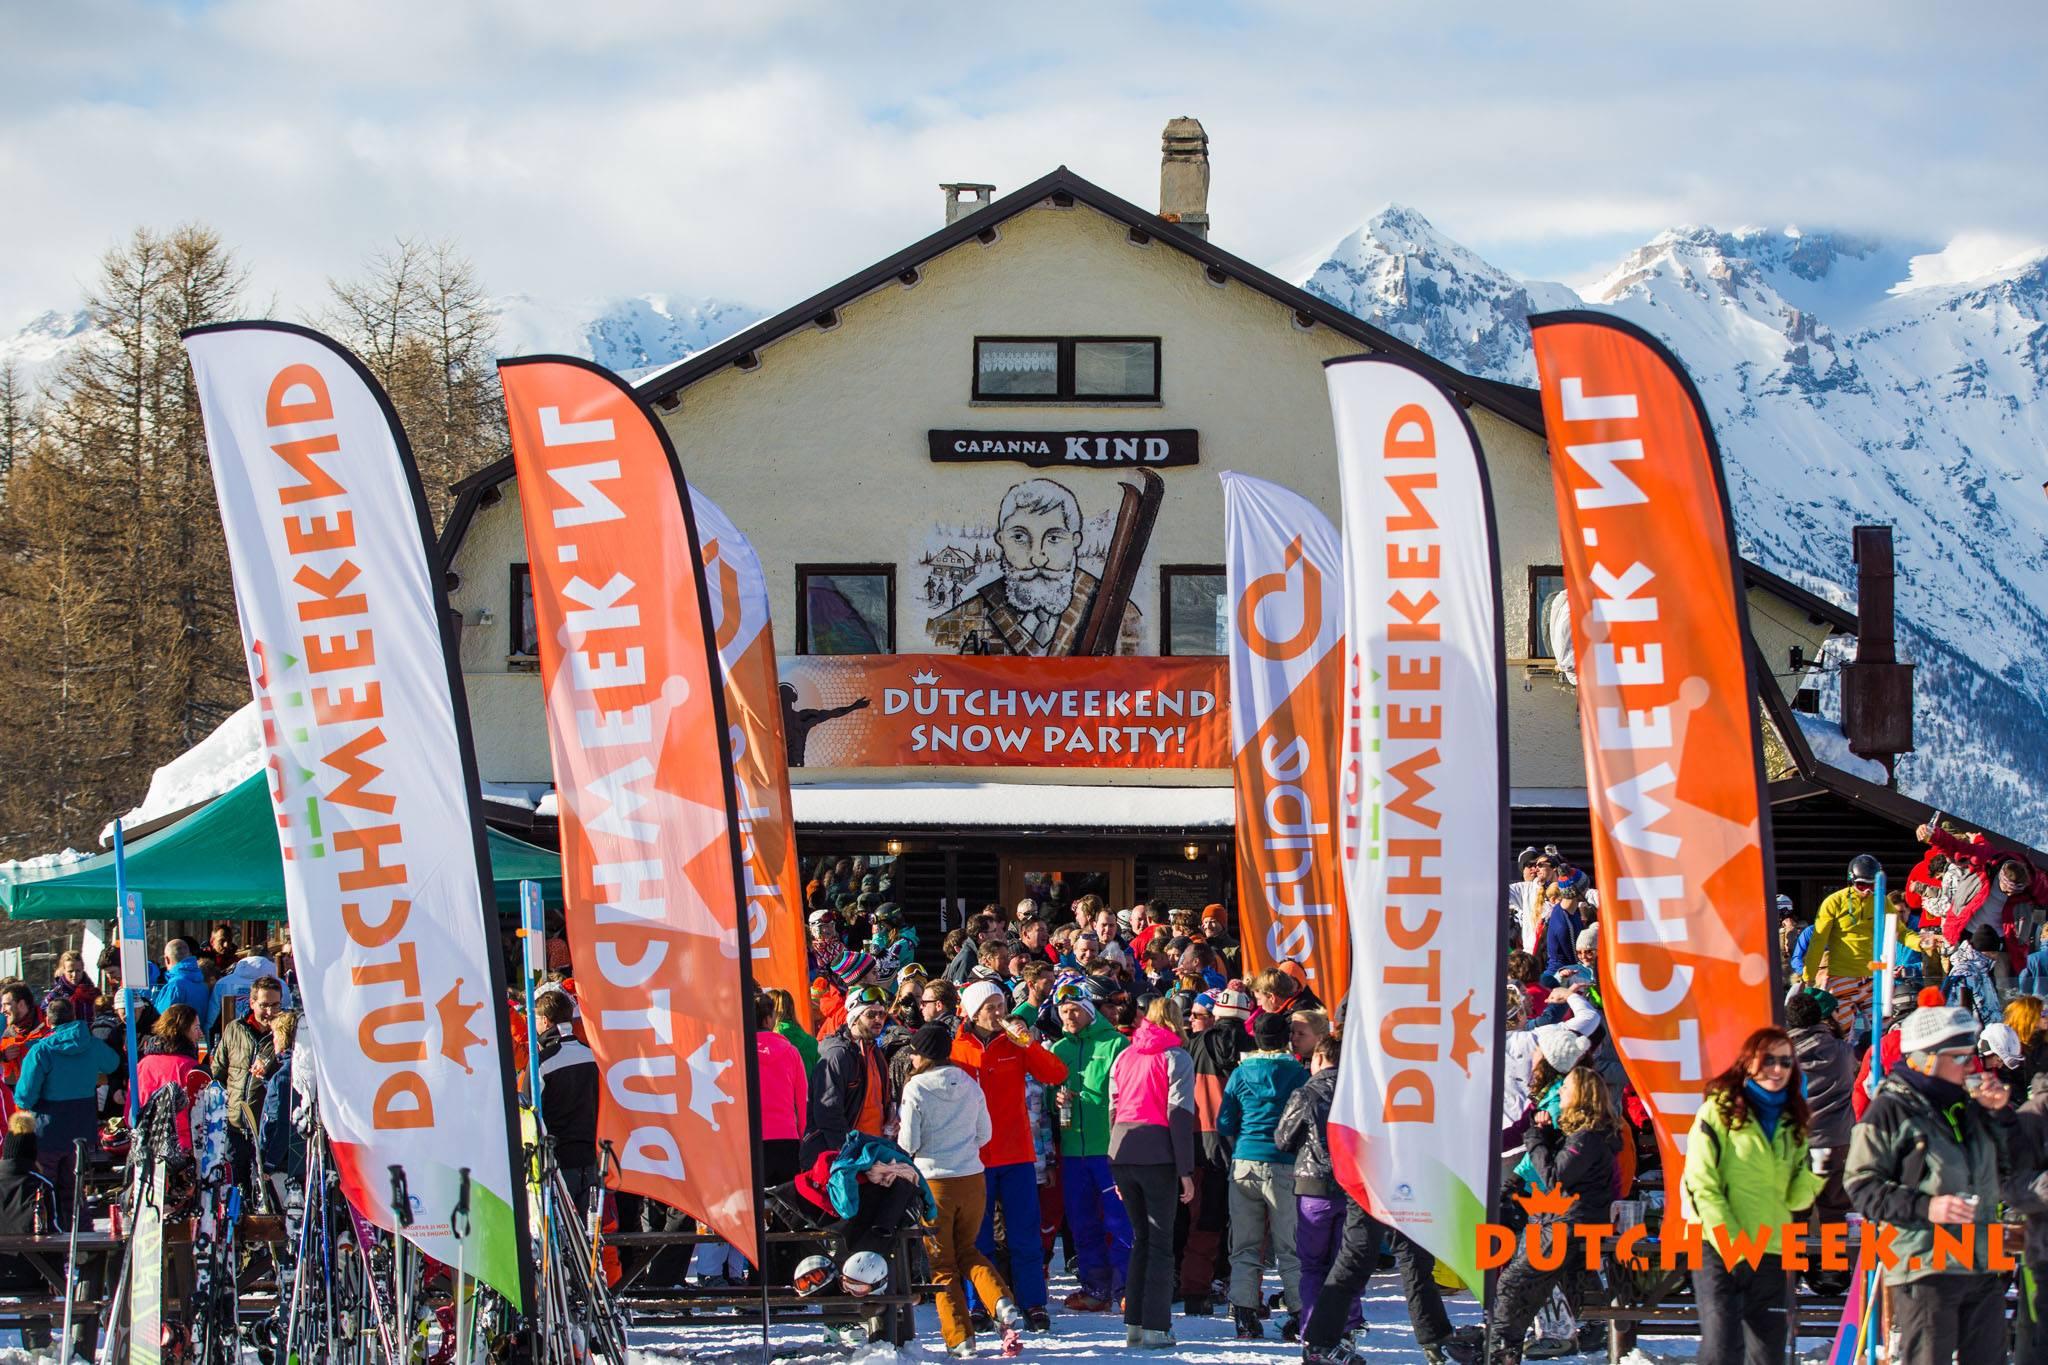 Dutchweekend Italia - après-ski